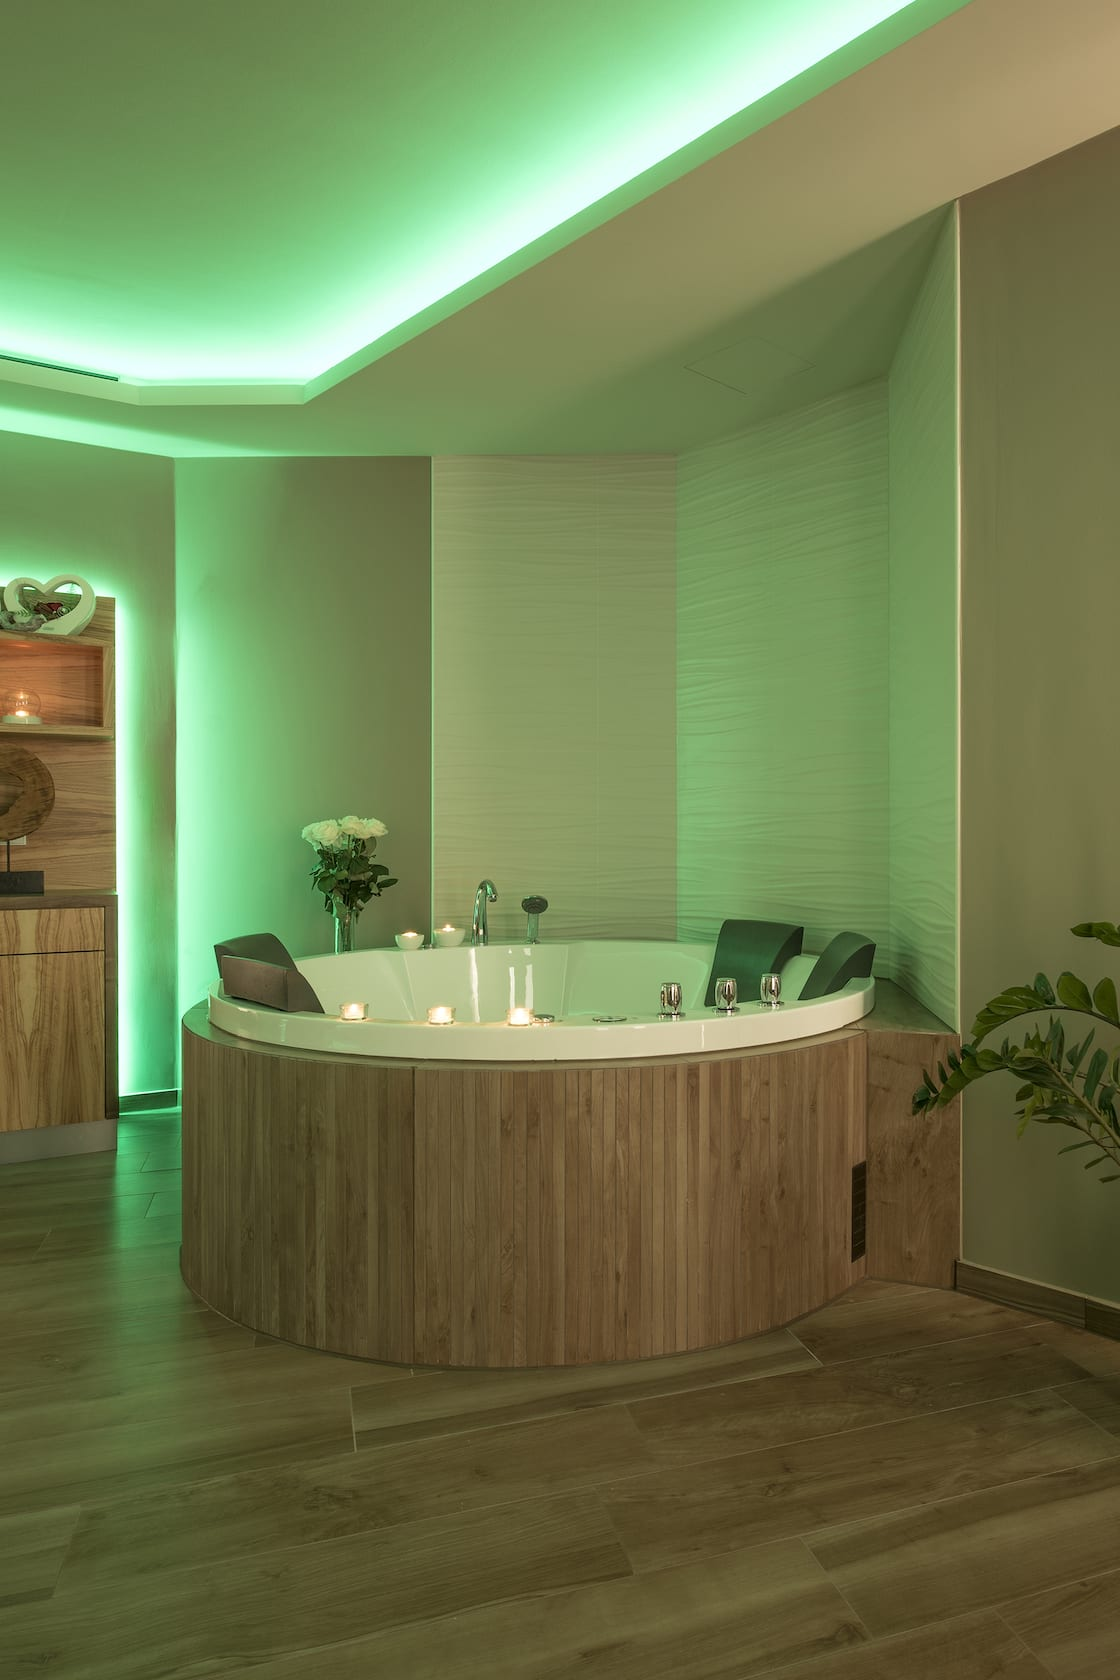 Private-Spa-Suite SPA & Wellnessresort Mooshof Bodenmais ...